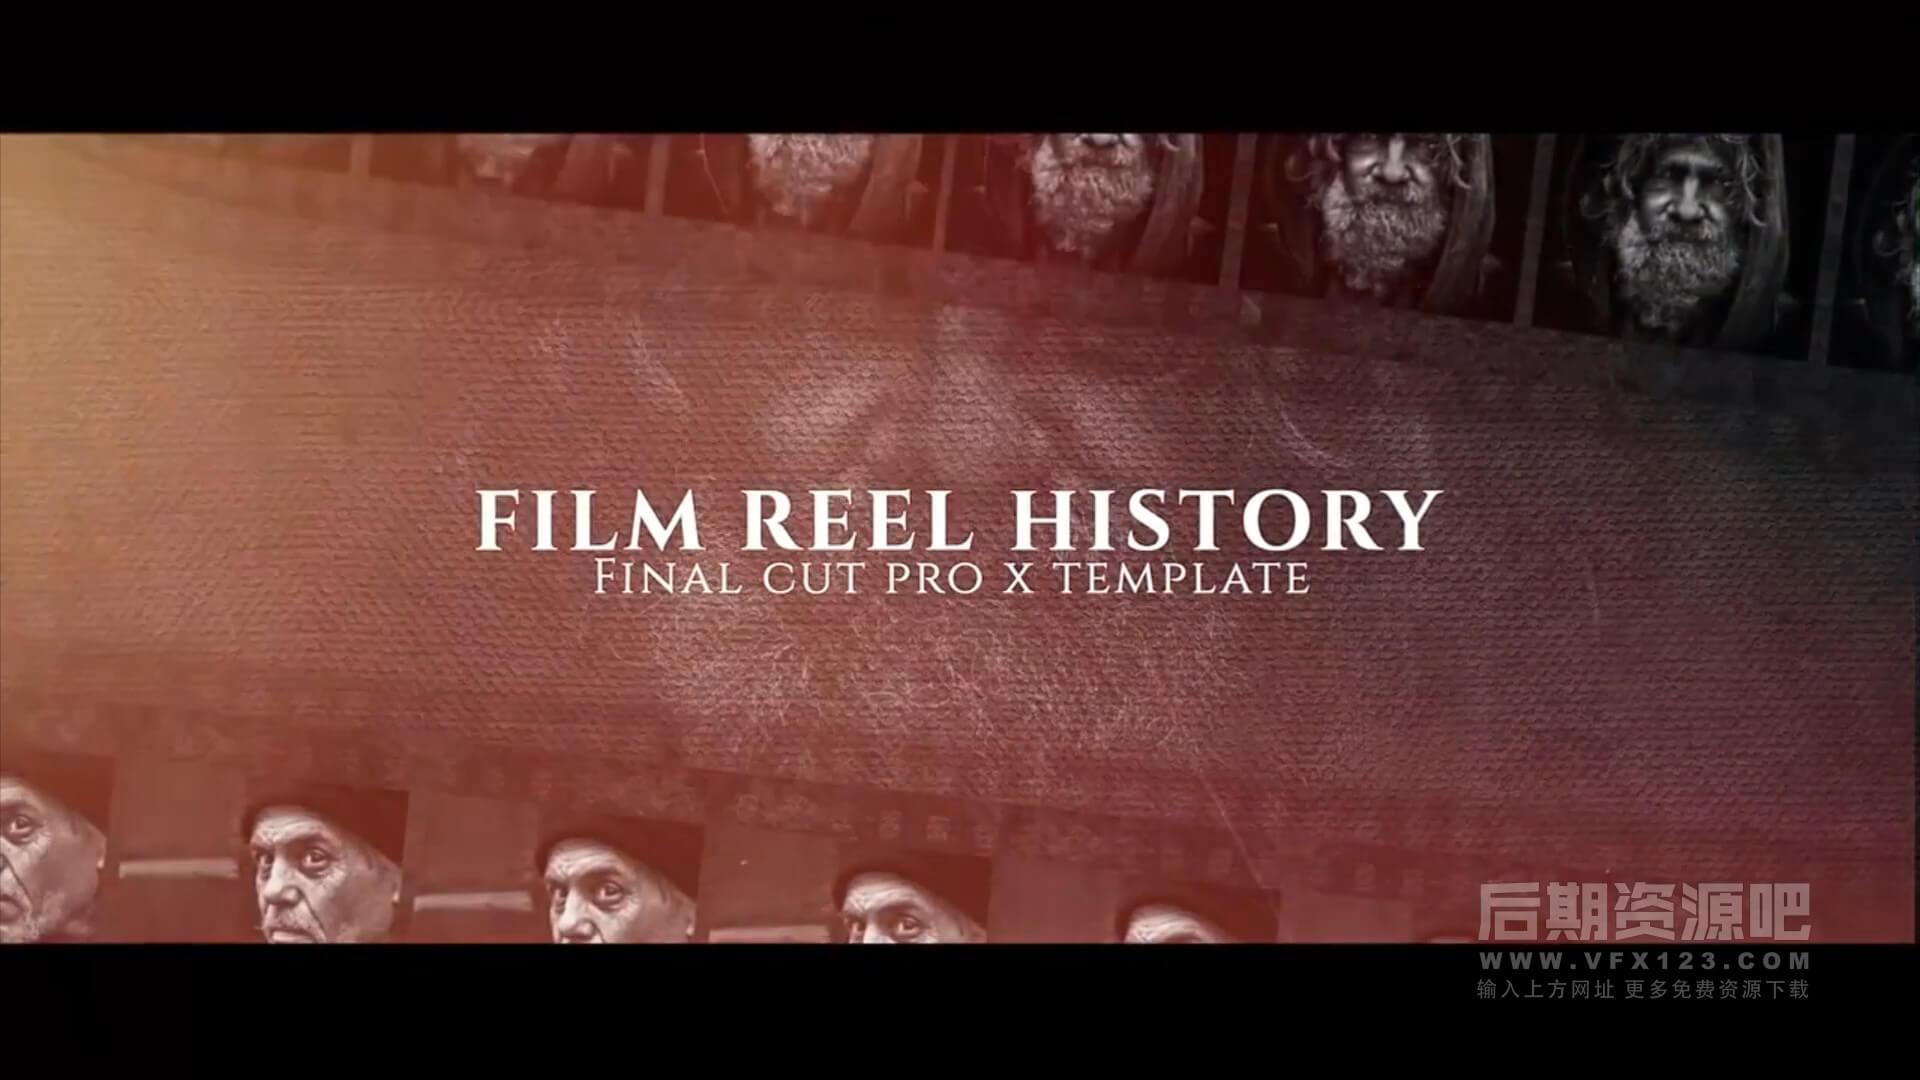 FCPX主题模板 胶片风格历史回顾纪念相册 Film Reel History